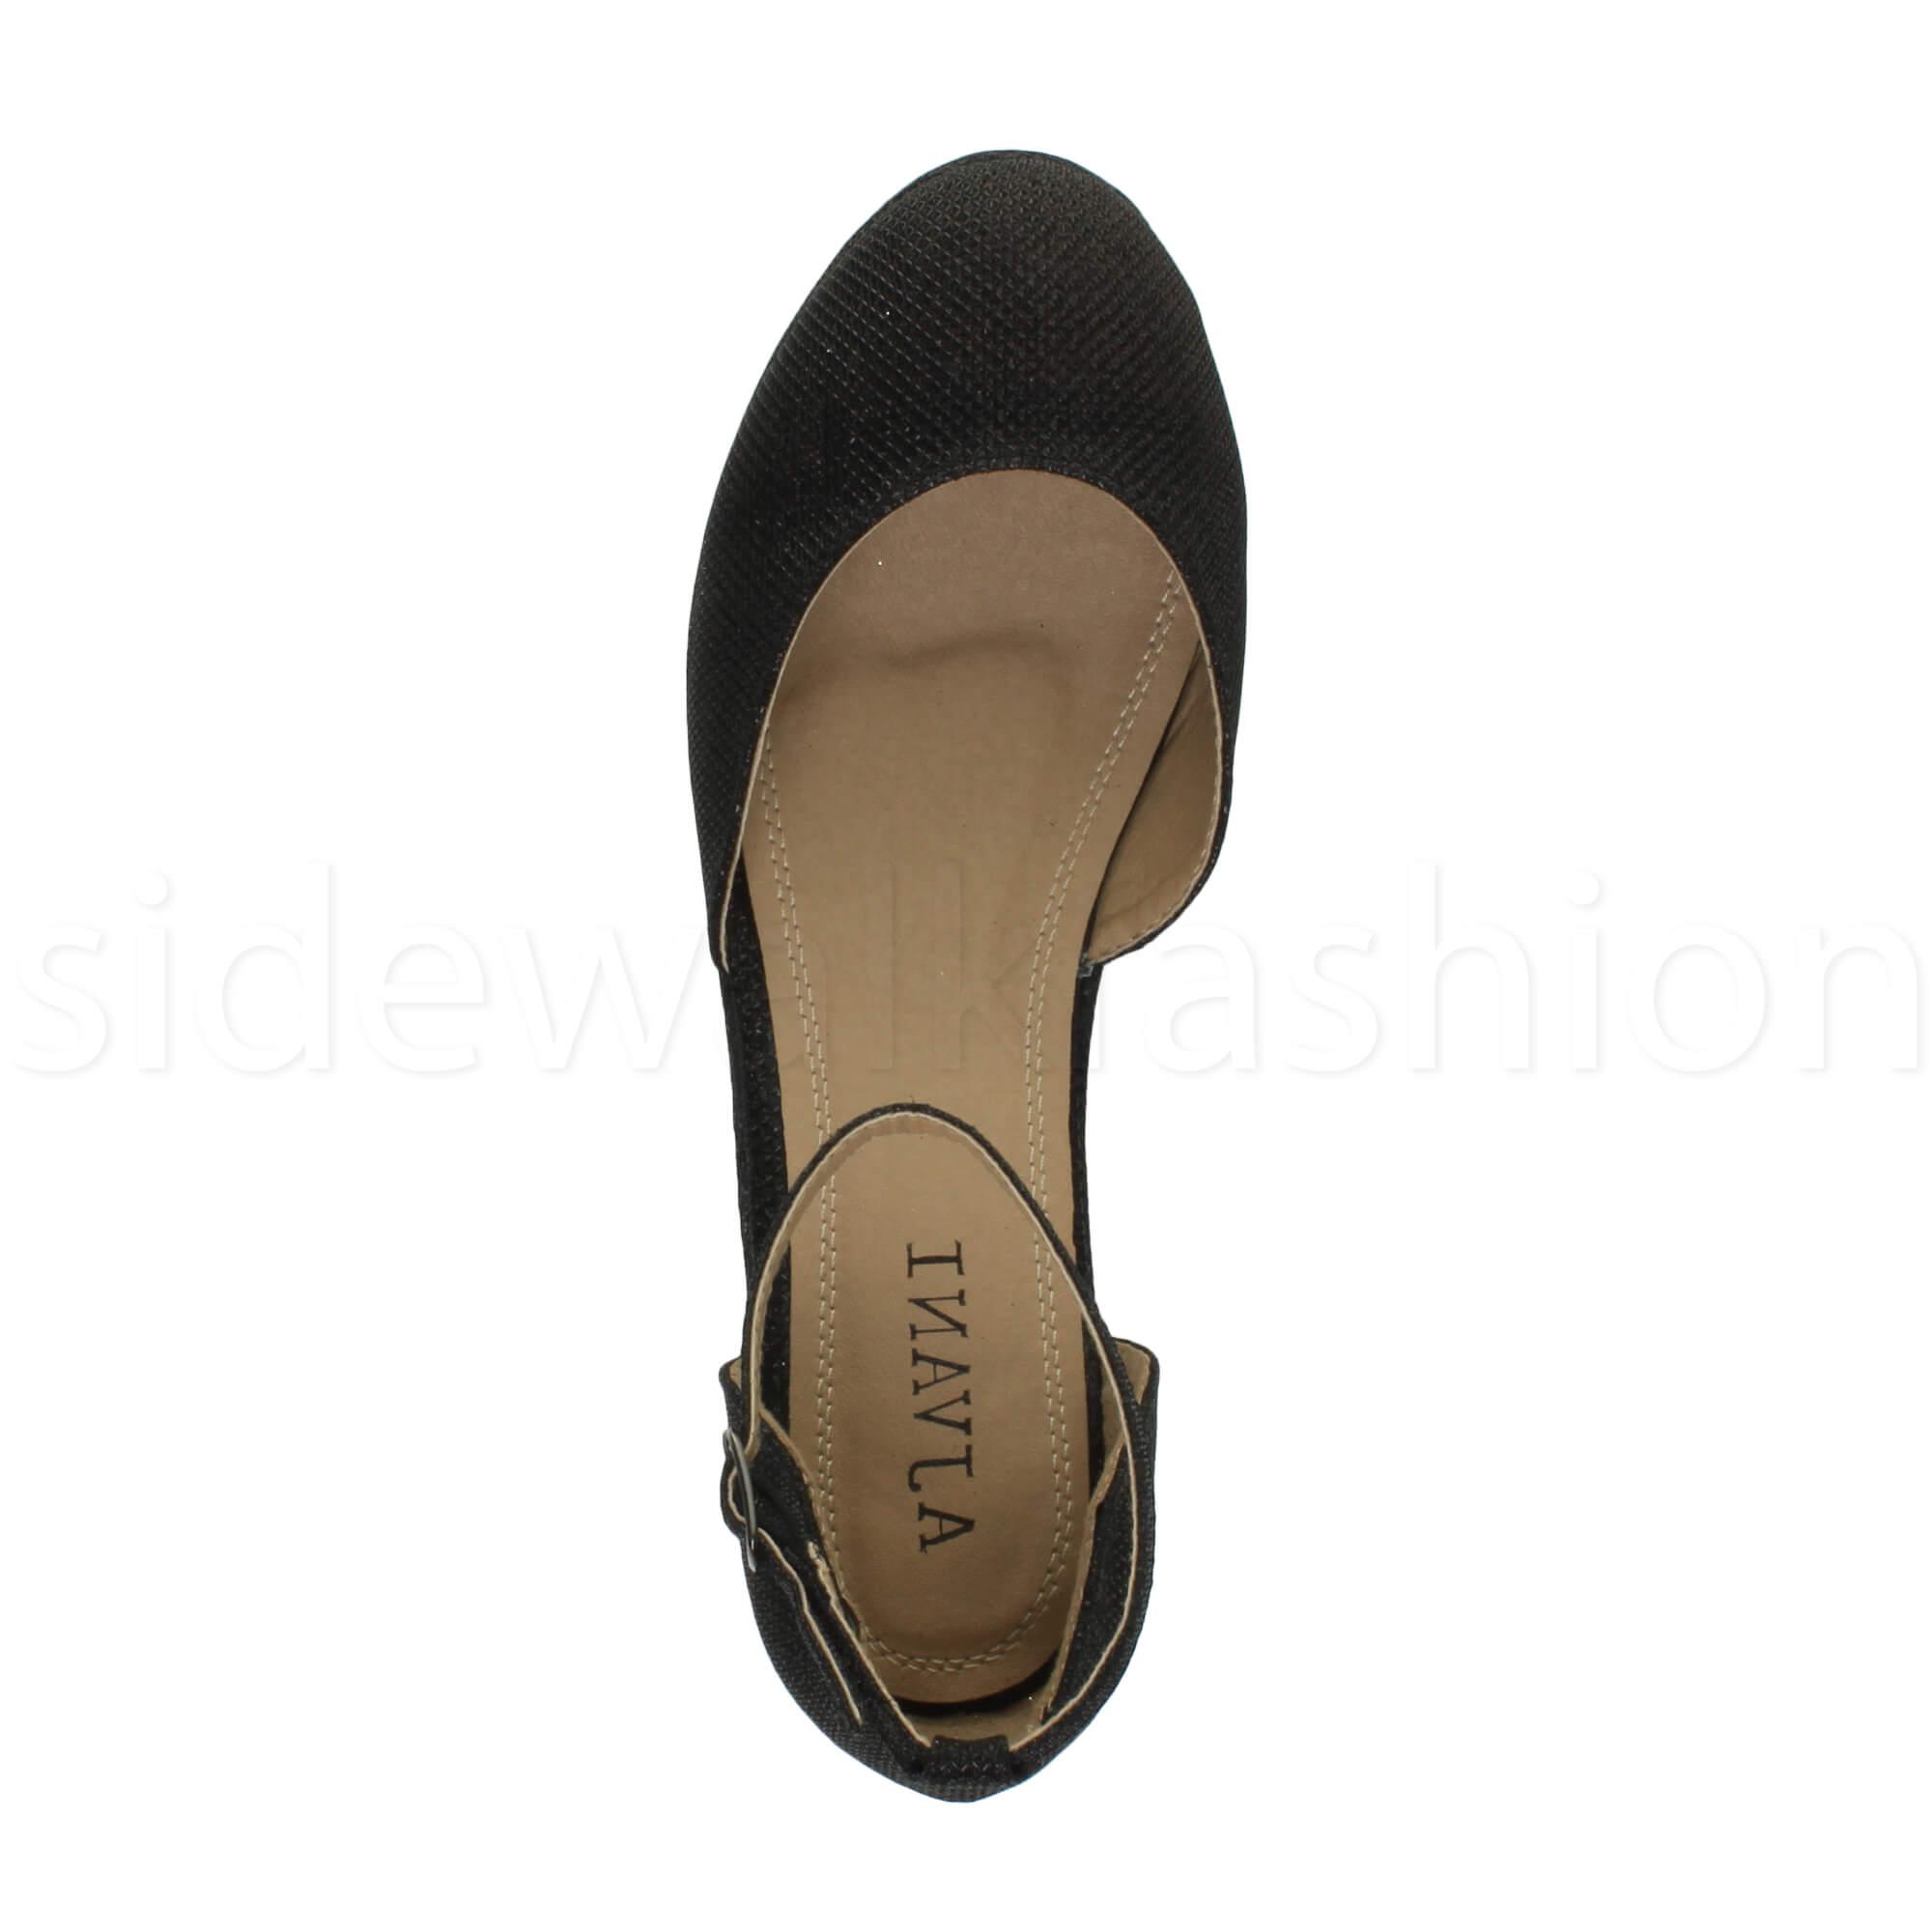 Womens-ladies-flatform-mid-wedge-ankle-strap-platform-court-shoes-sandals-size thumbnail 8